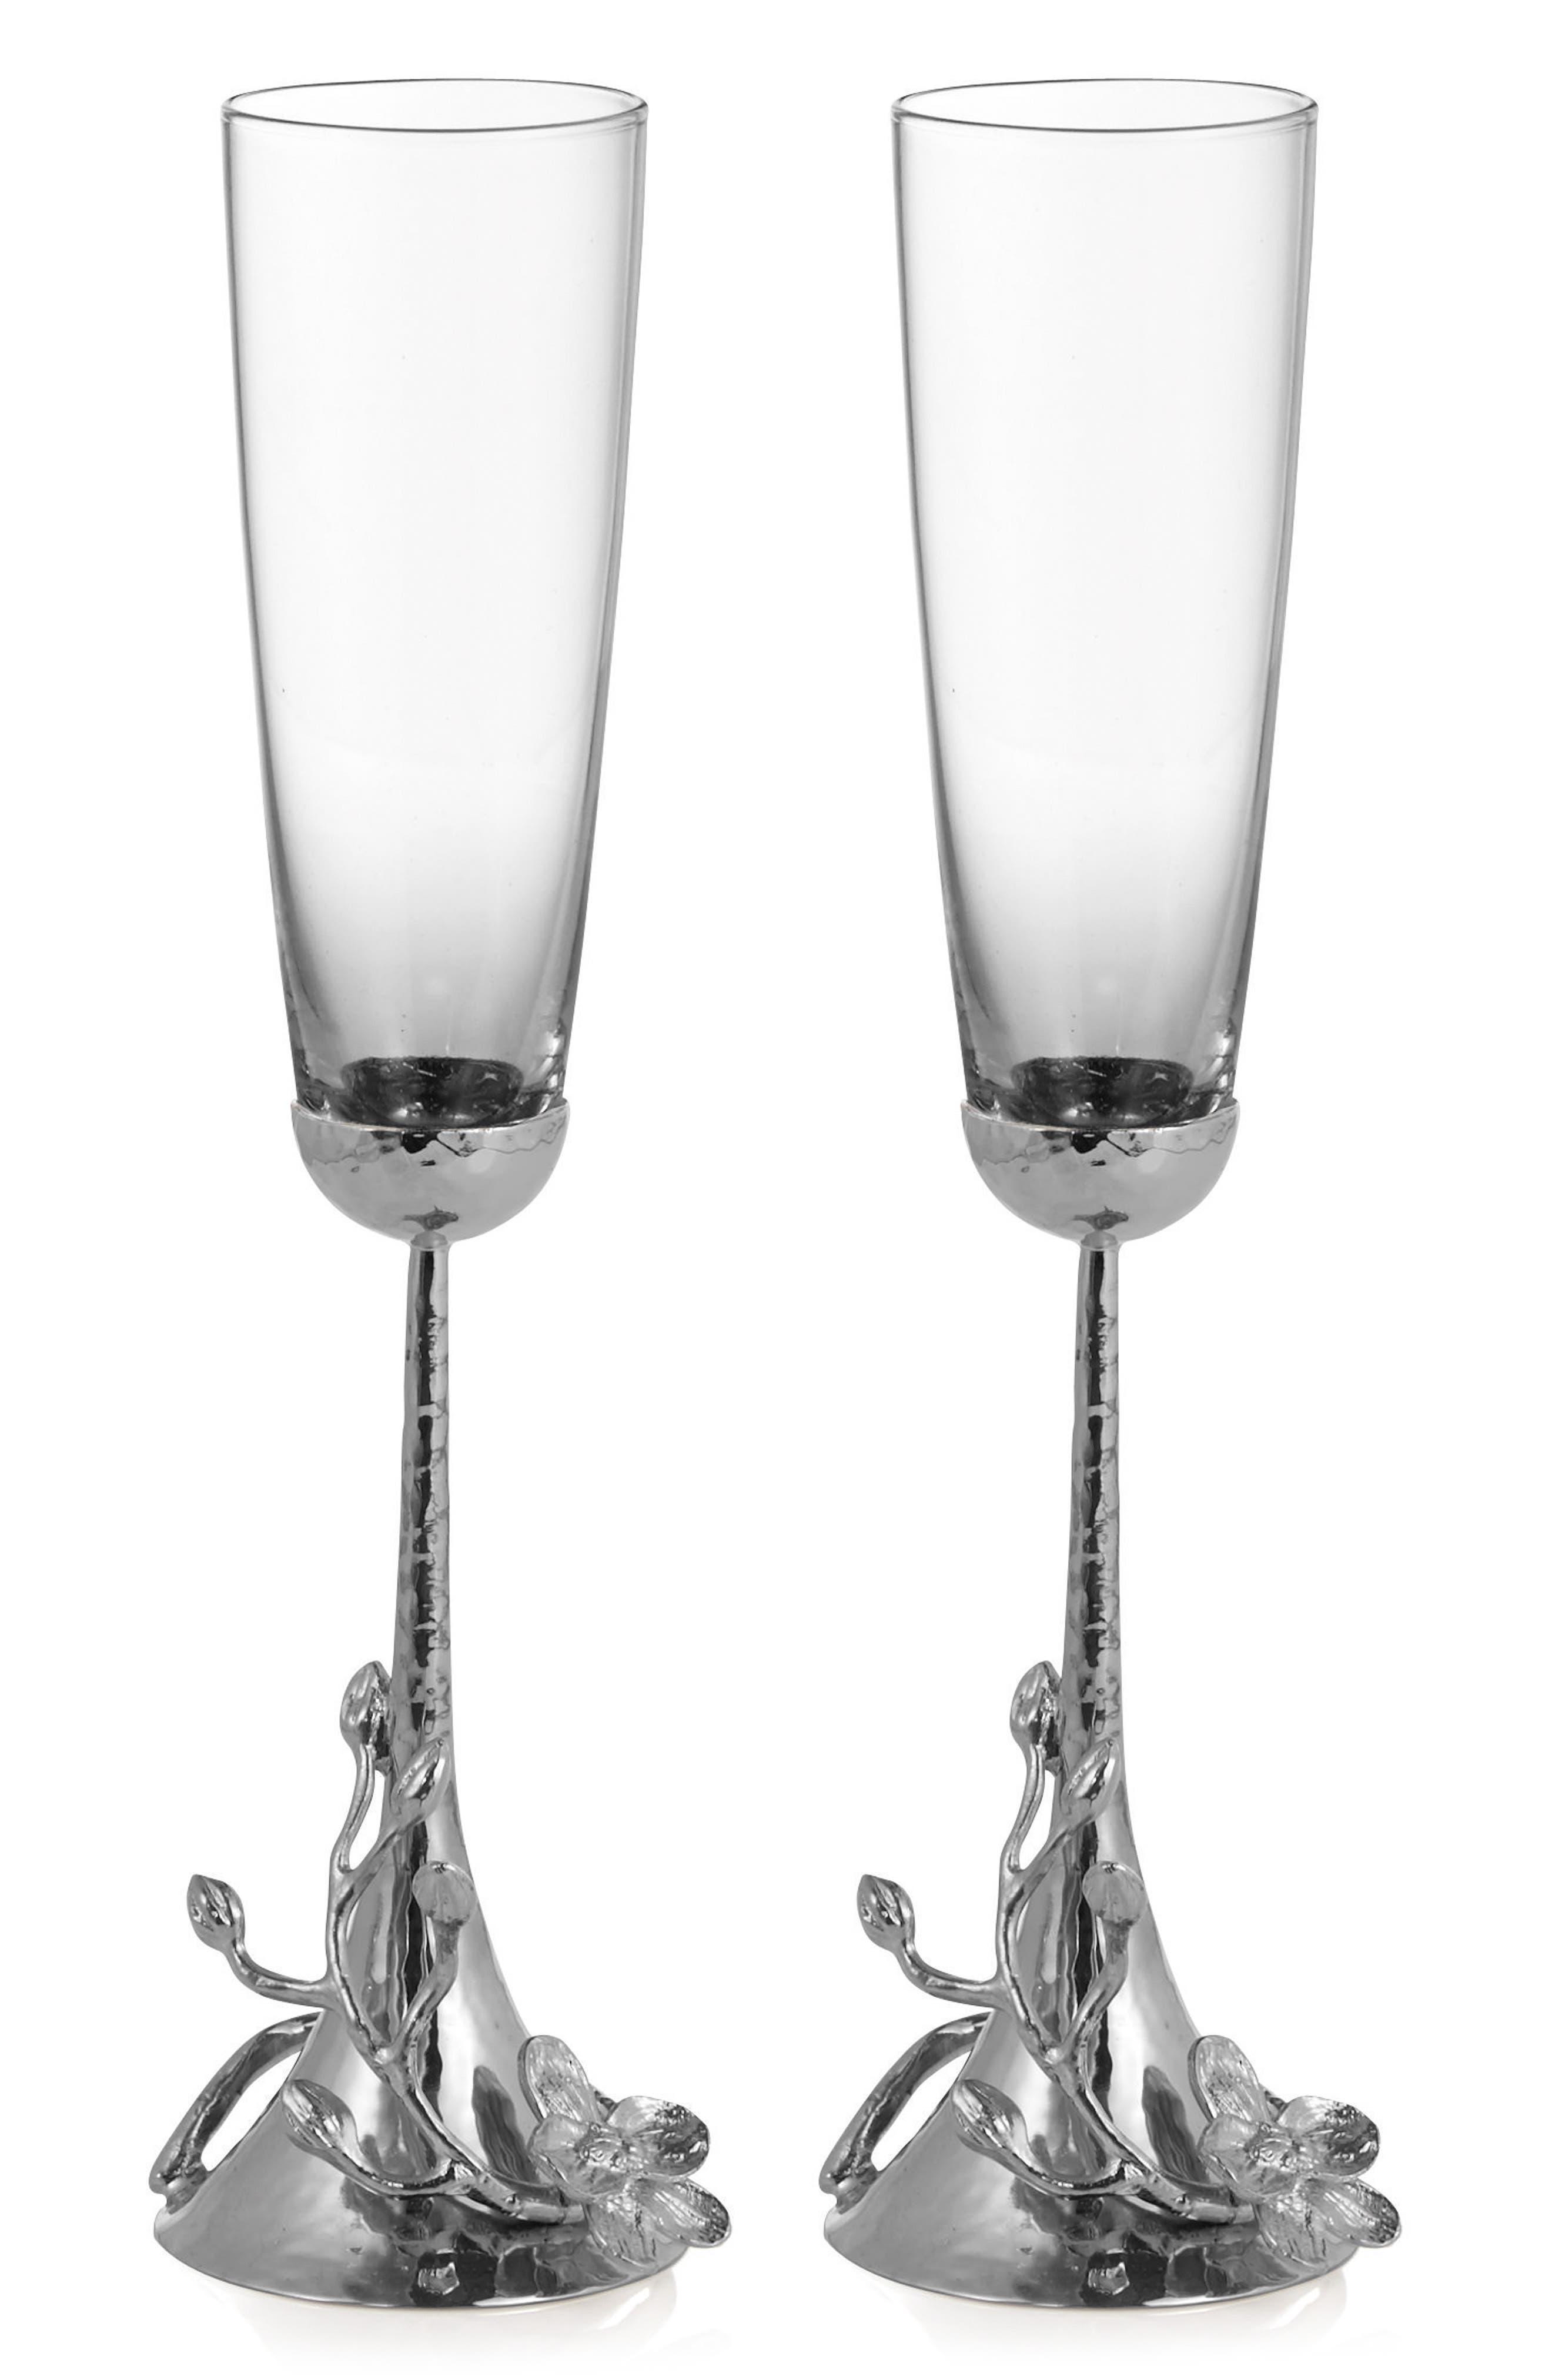 Main Image - Michael Aram White Orchid Set of 2 Toasting Flutes